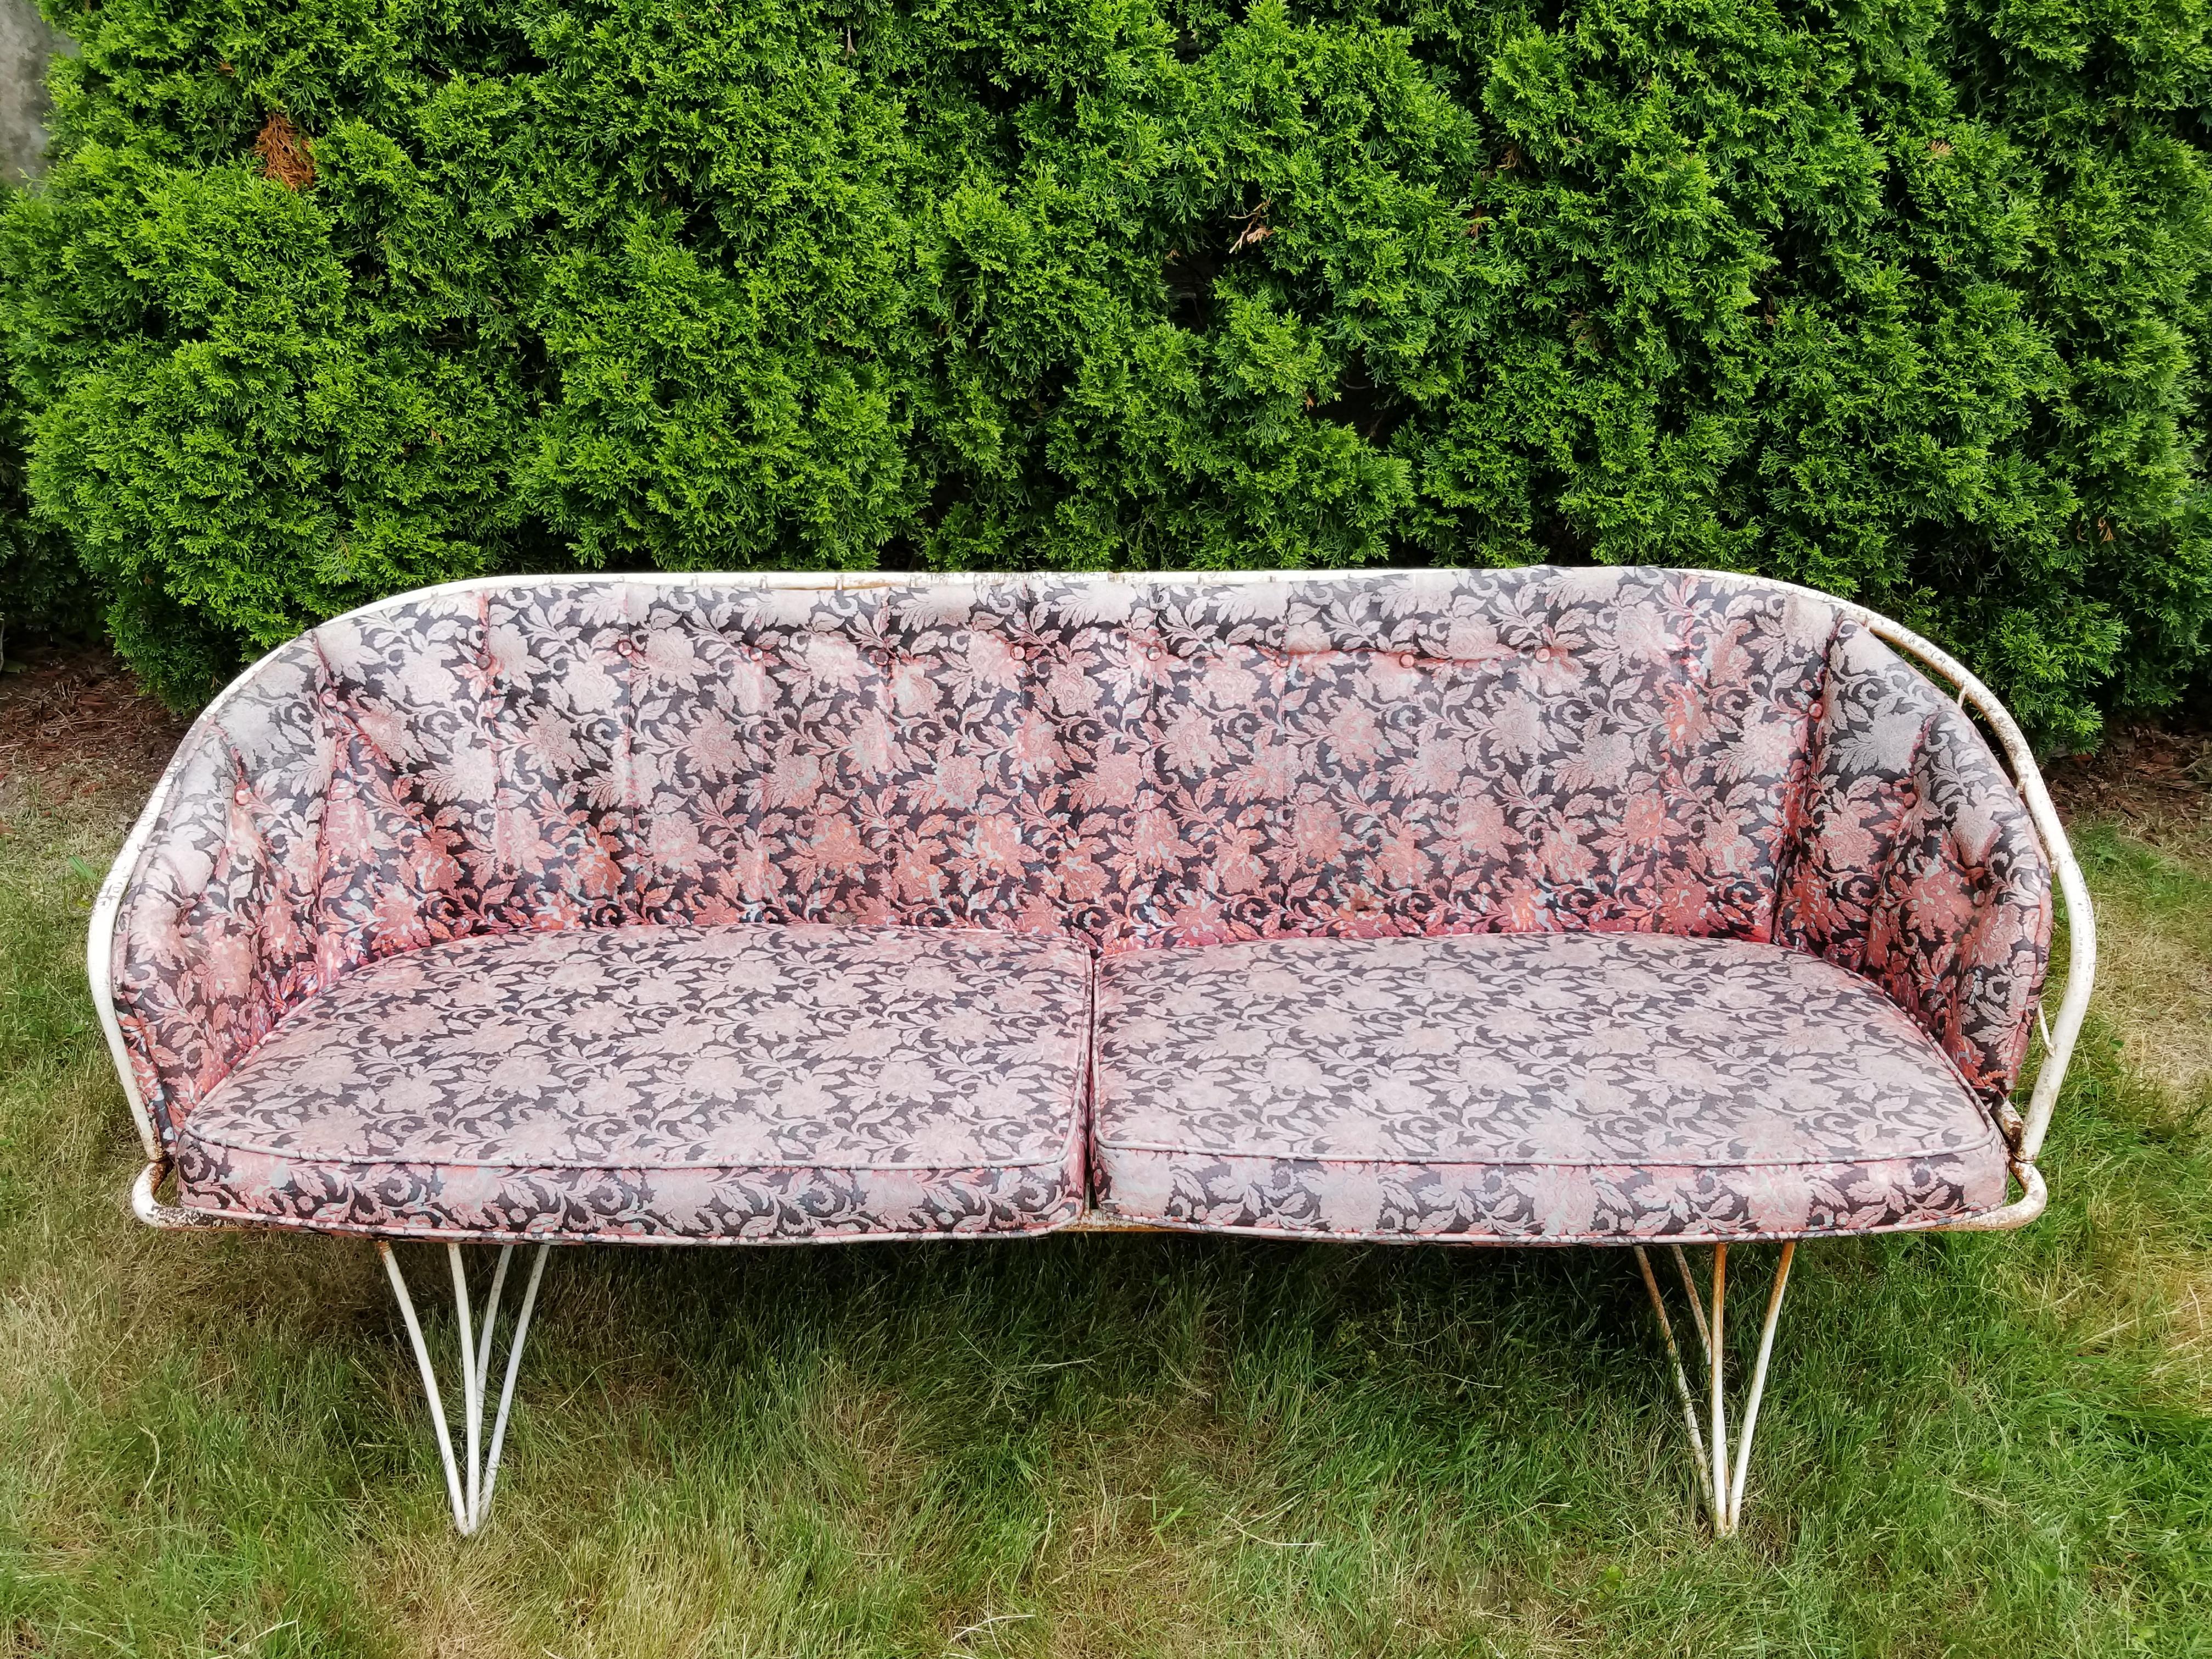 Vintage Homecrest Wrought Iron Patio Couch U0026 Rocker Bouncer Chair 3 Piece  Set   Image 4